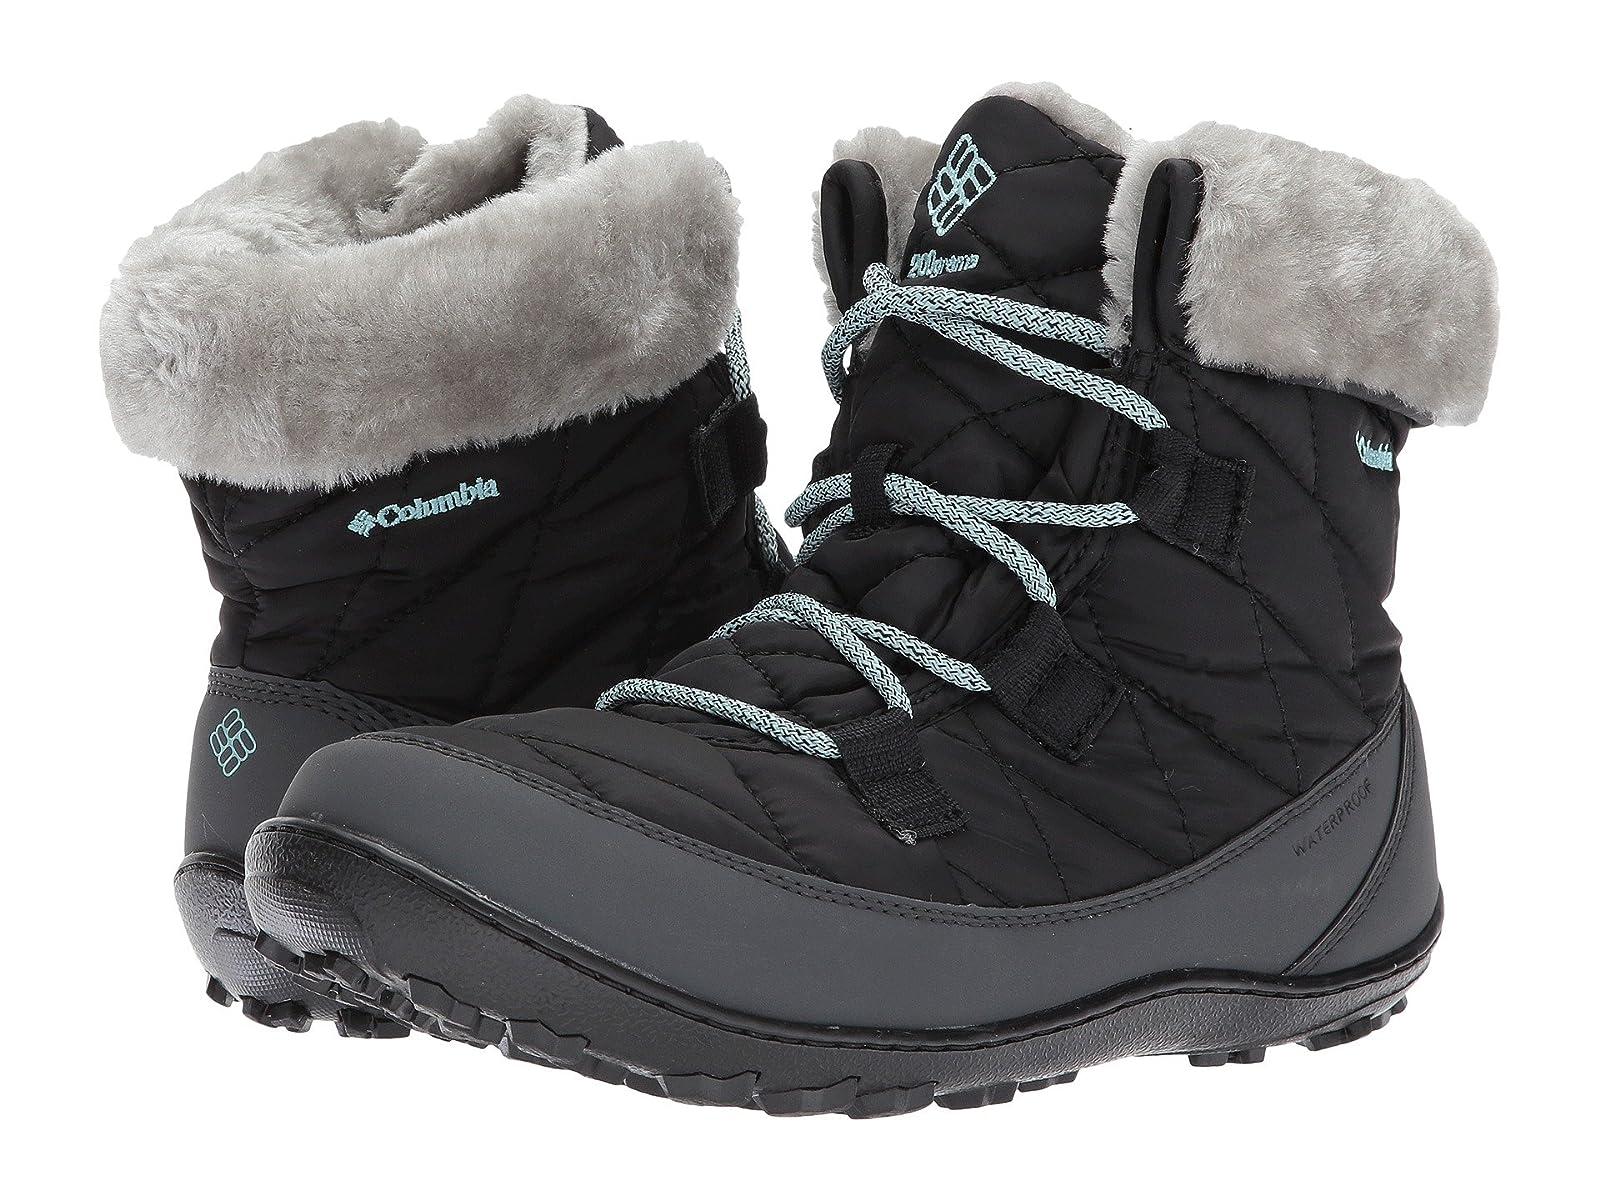 Columbia Kids Minx Shorty Omni-Heat Waterproof (Little Kid/Big Kid)Affordable and distinctive shoes